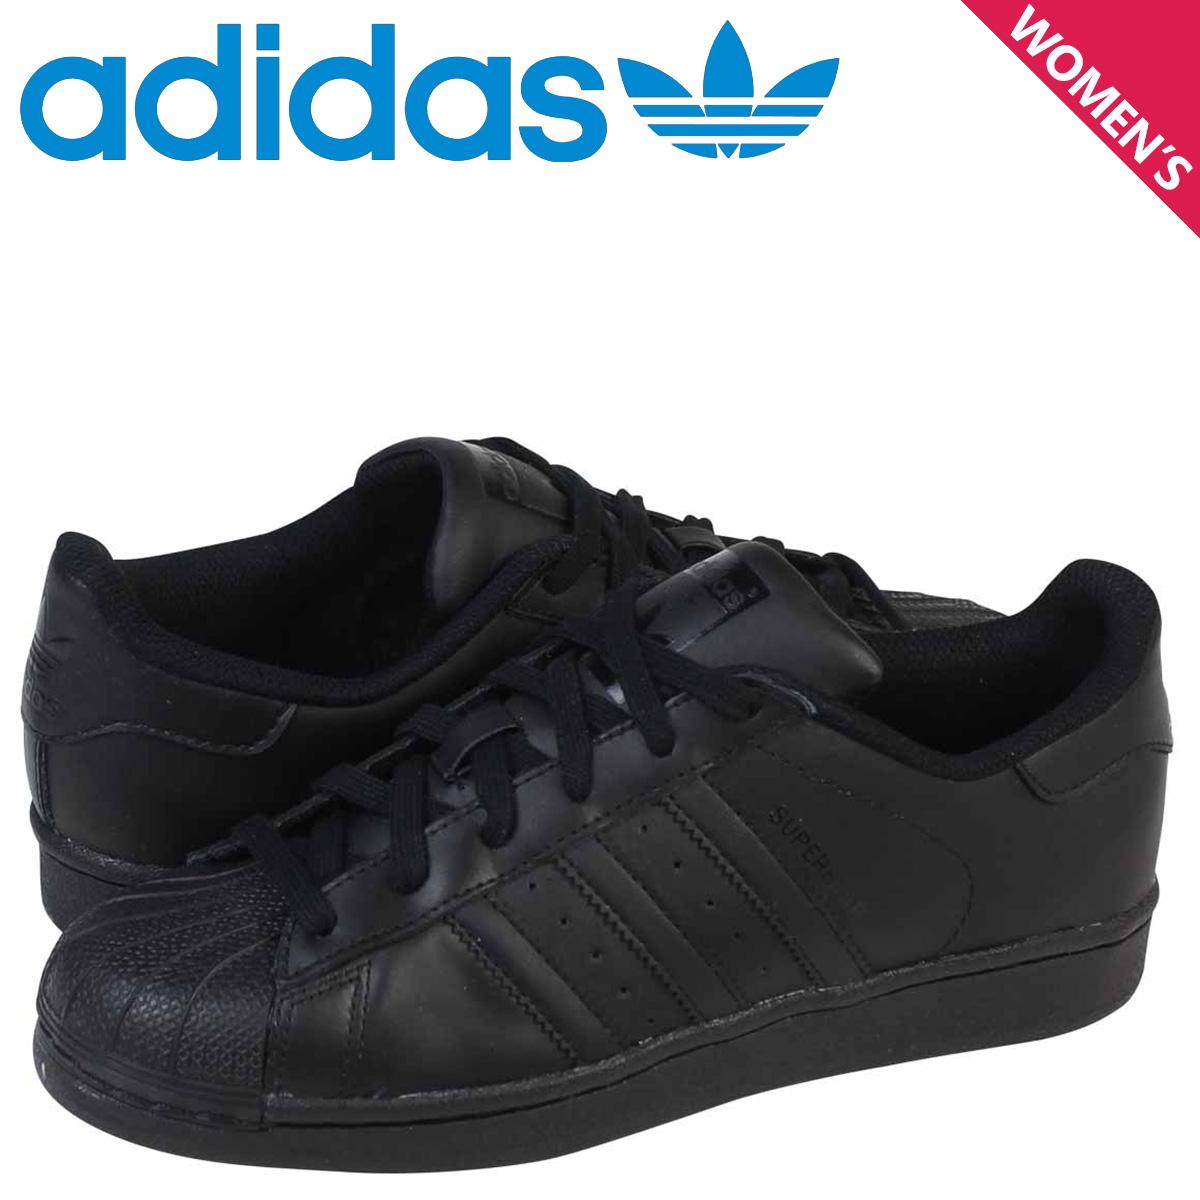 Adidas originals superstar Lady's adidas